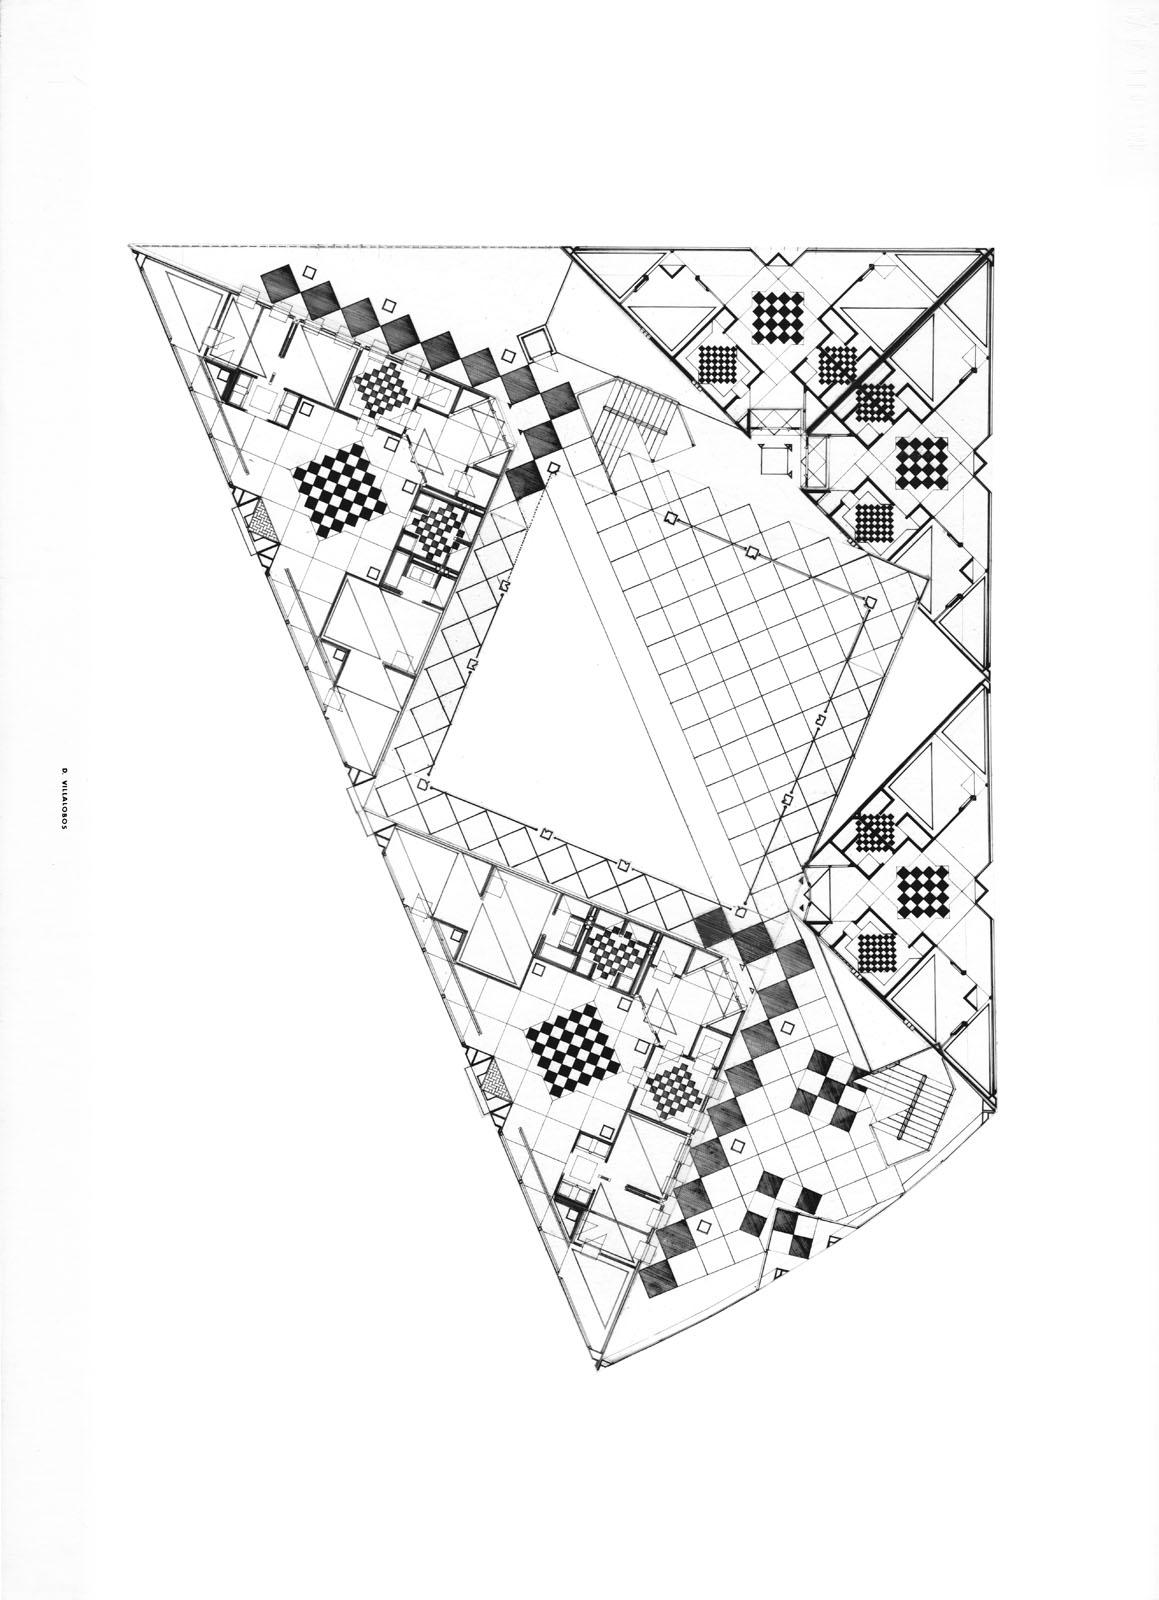 danielvillalobos-architecturexxthcentury-spanisharchitecture-schoolarchitectureproject-4